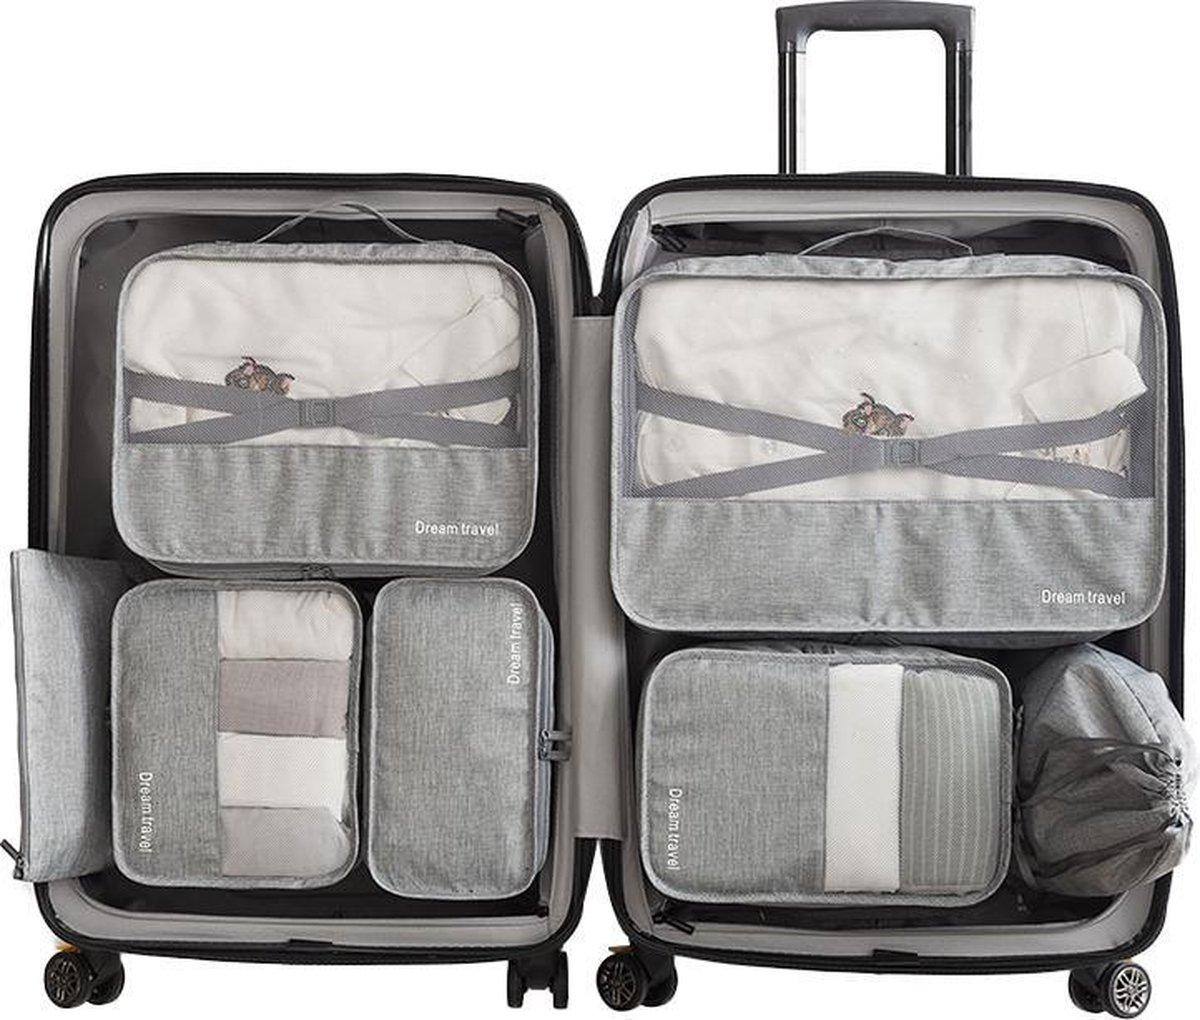 Luxe Packing Cubes set - Uitgebreide 7 delige set - Kleding organizer voor koffer en backpack - Baga